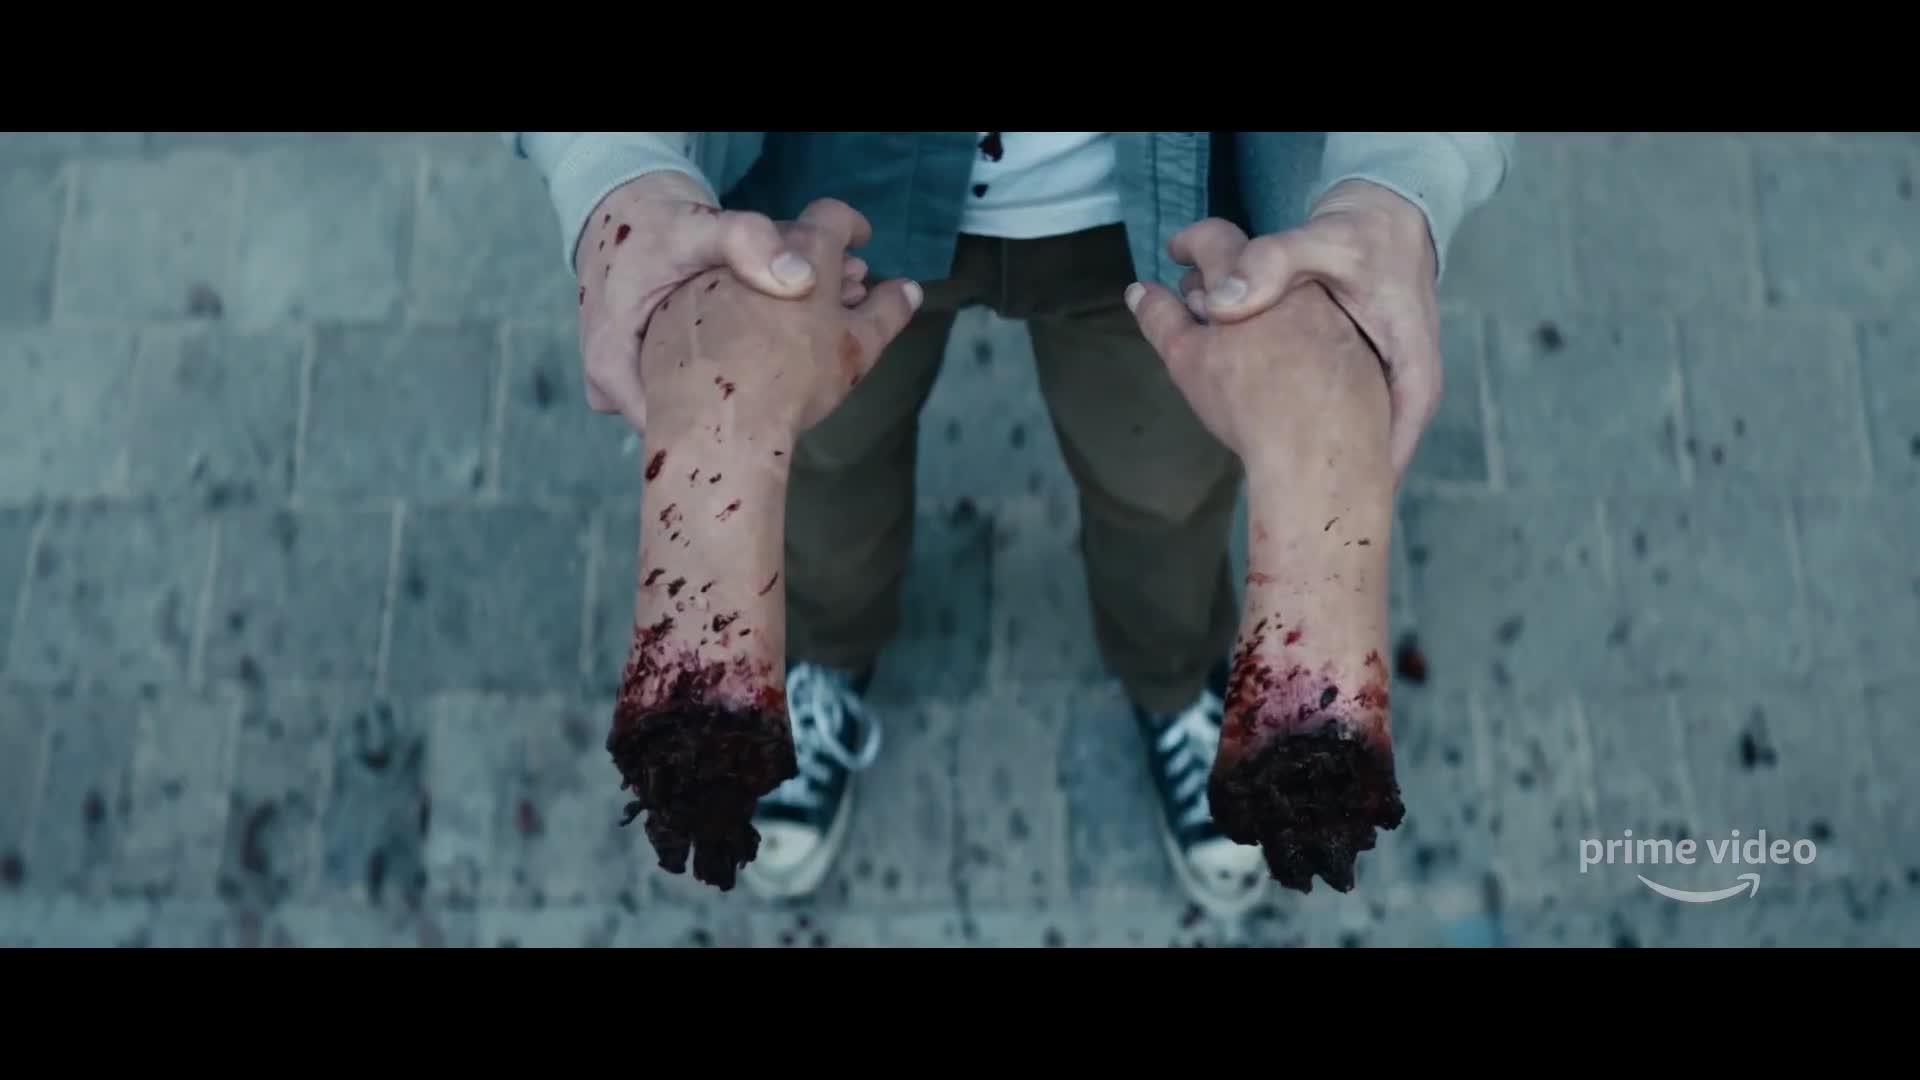 The Boys - Final Trailer [HD] screen capture